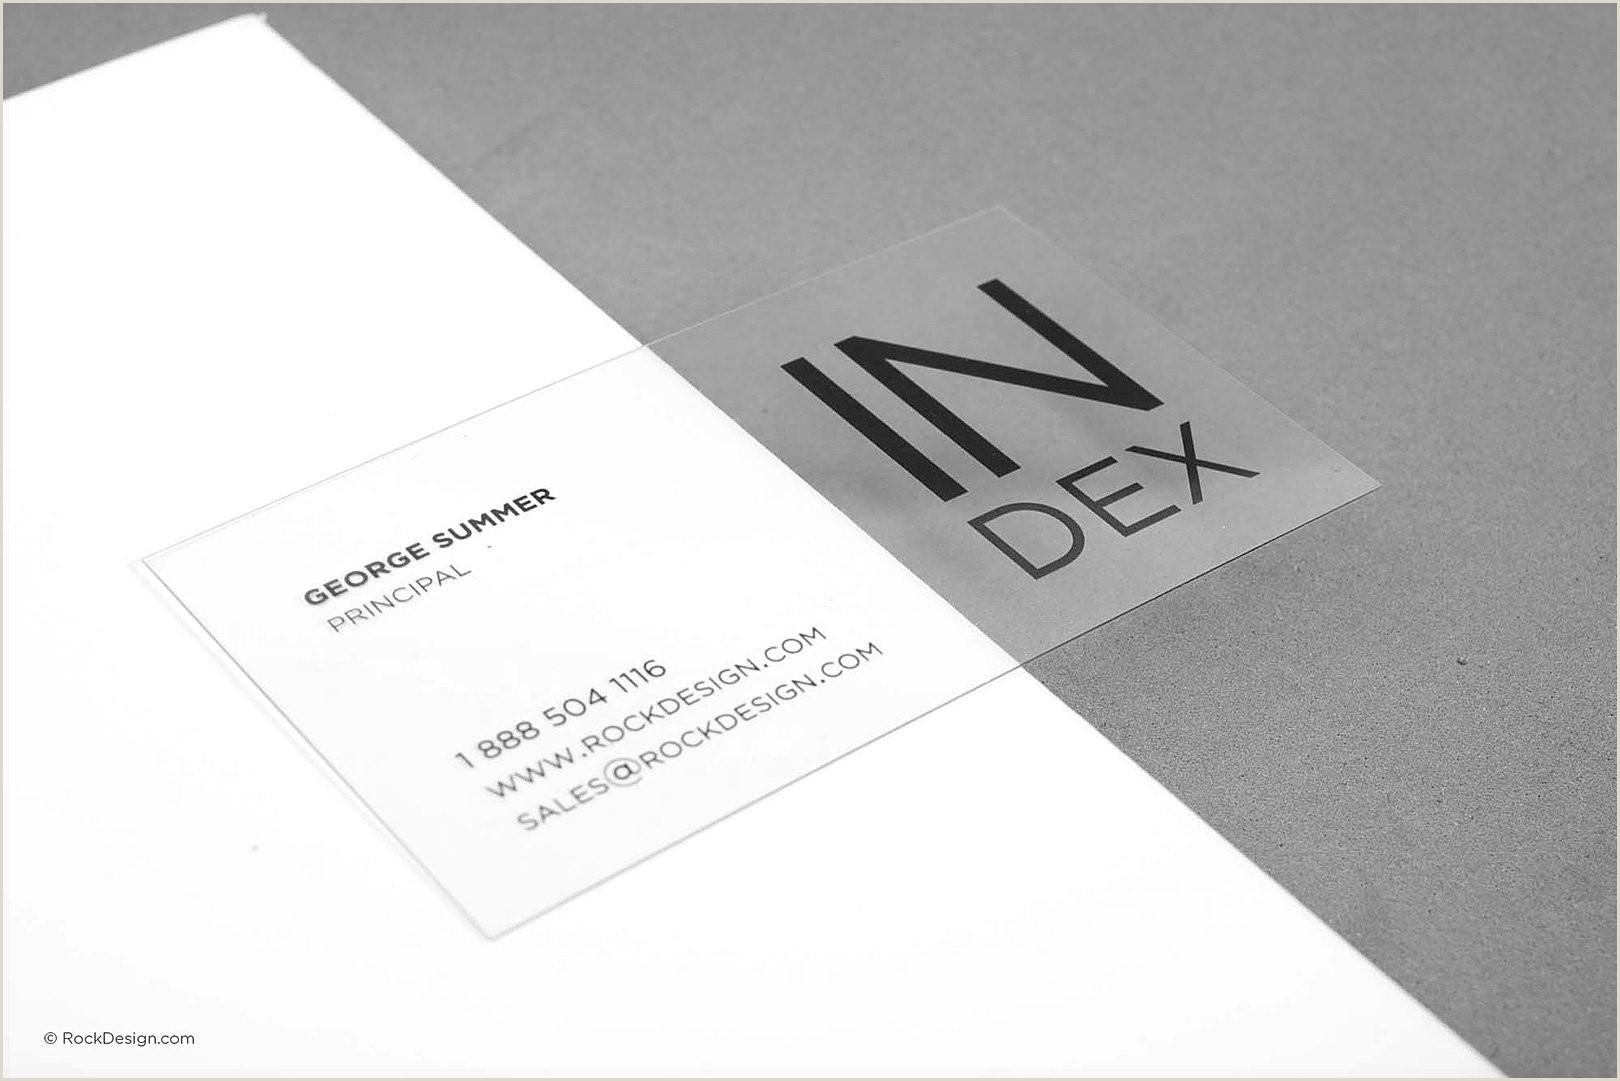 Unique Plastic Business Cards For Cpr Business Over 100 Free Online Unique Templates